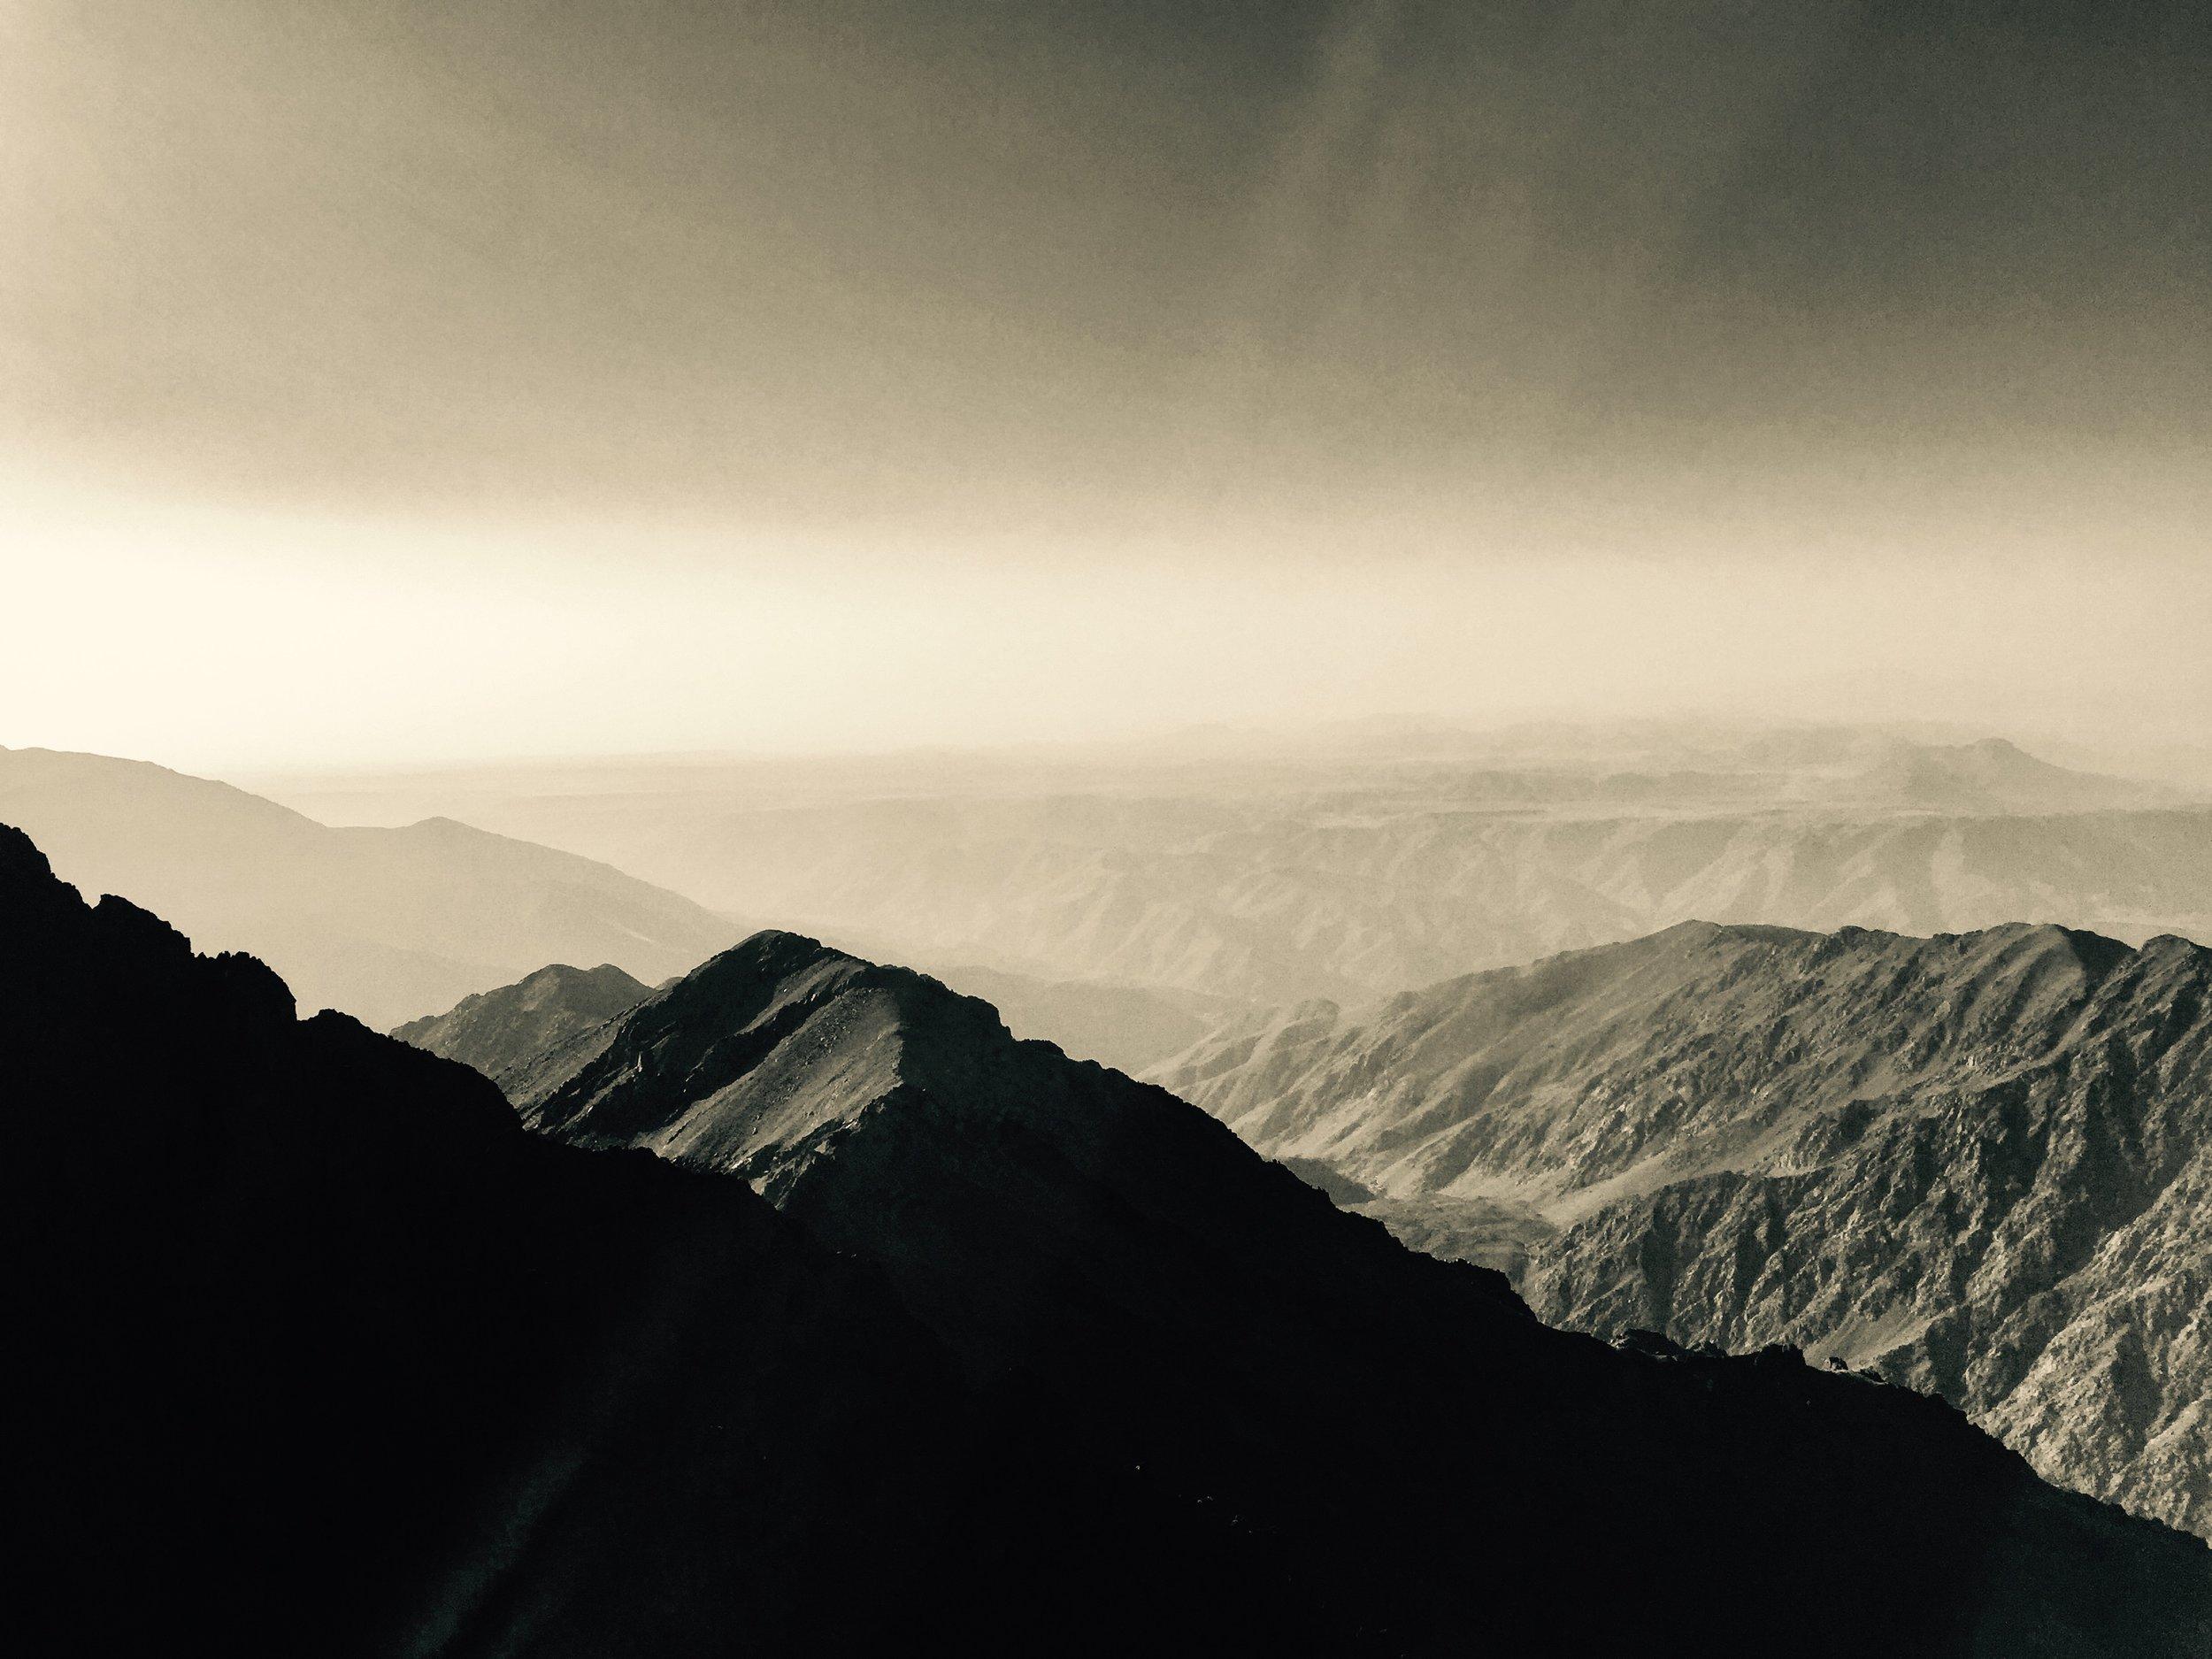 Morocco - High Highs